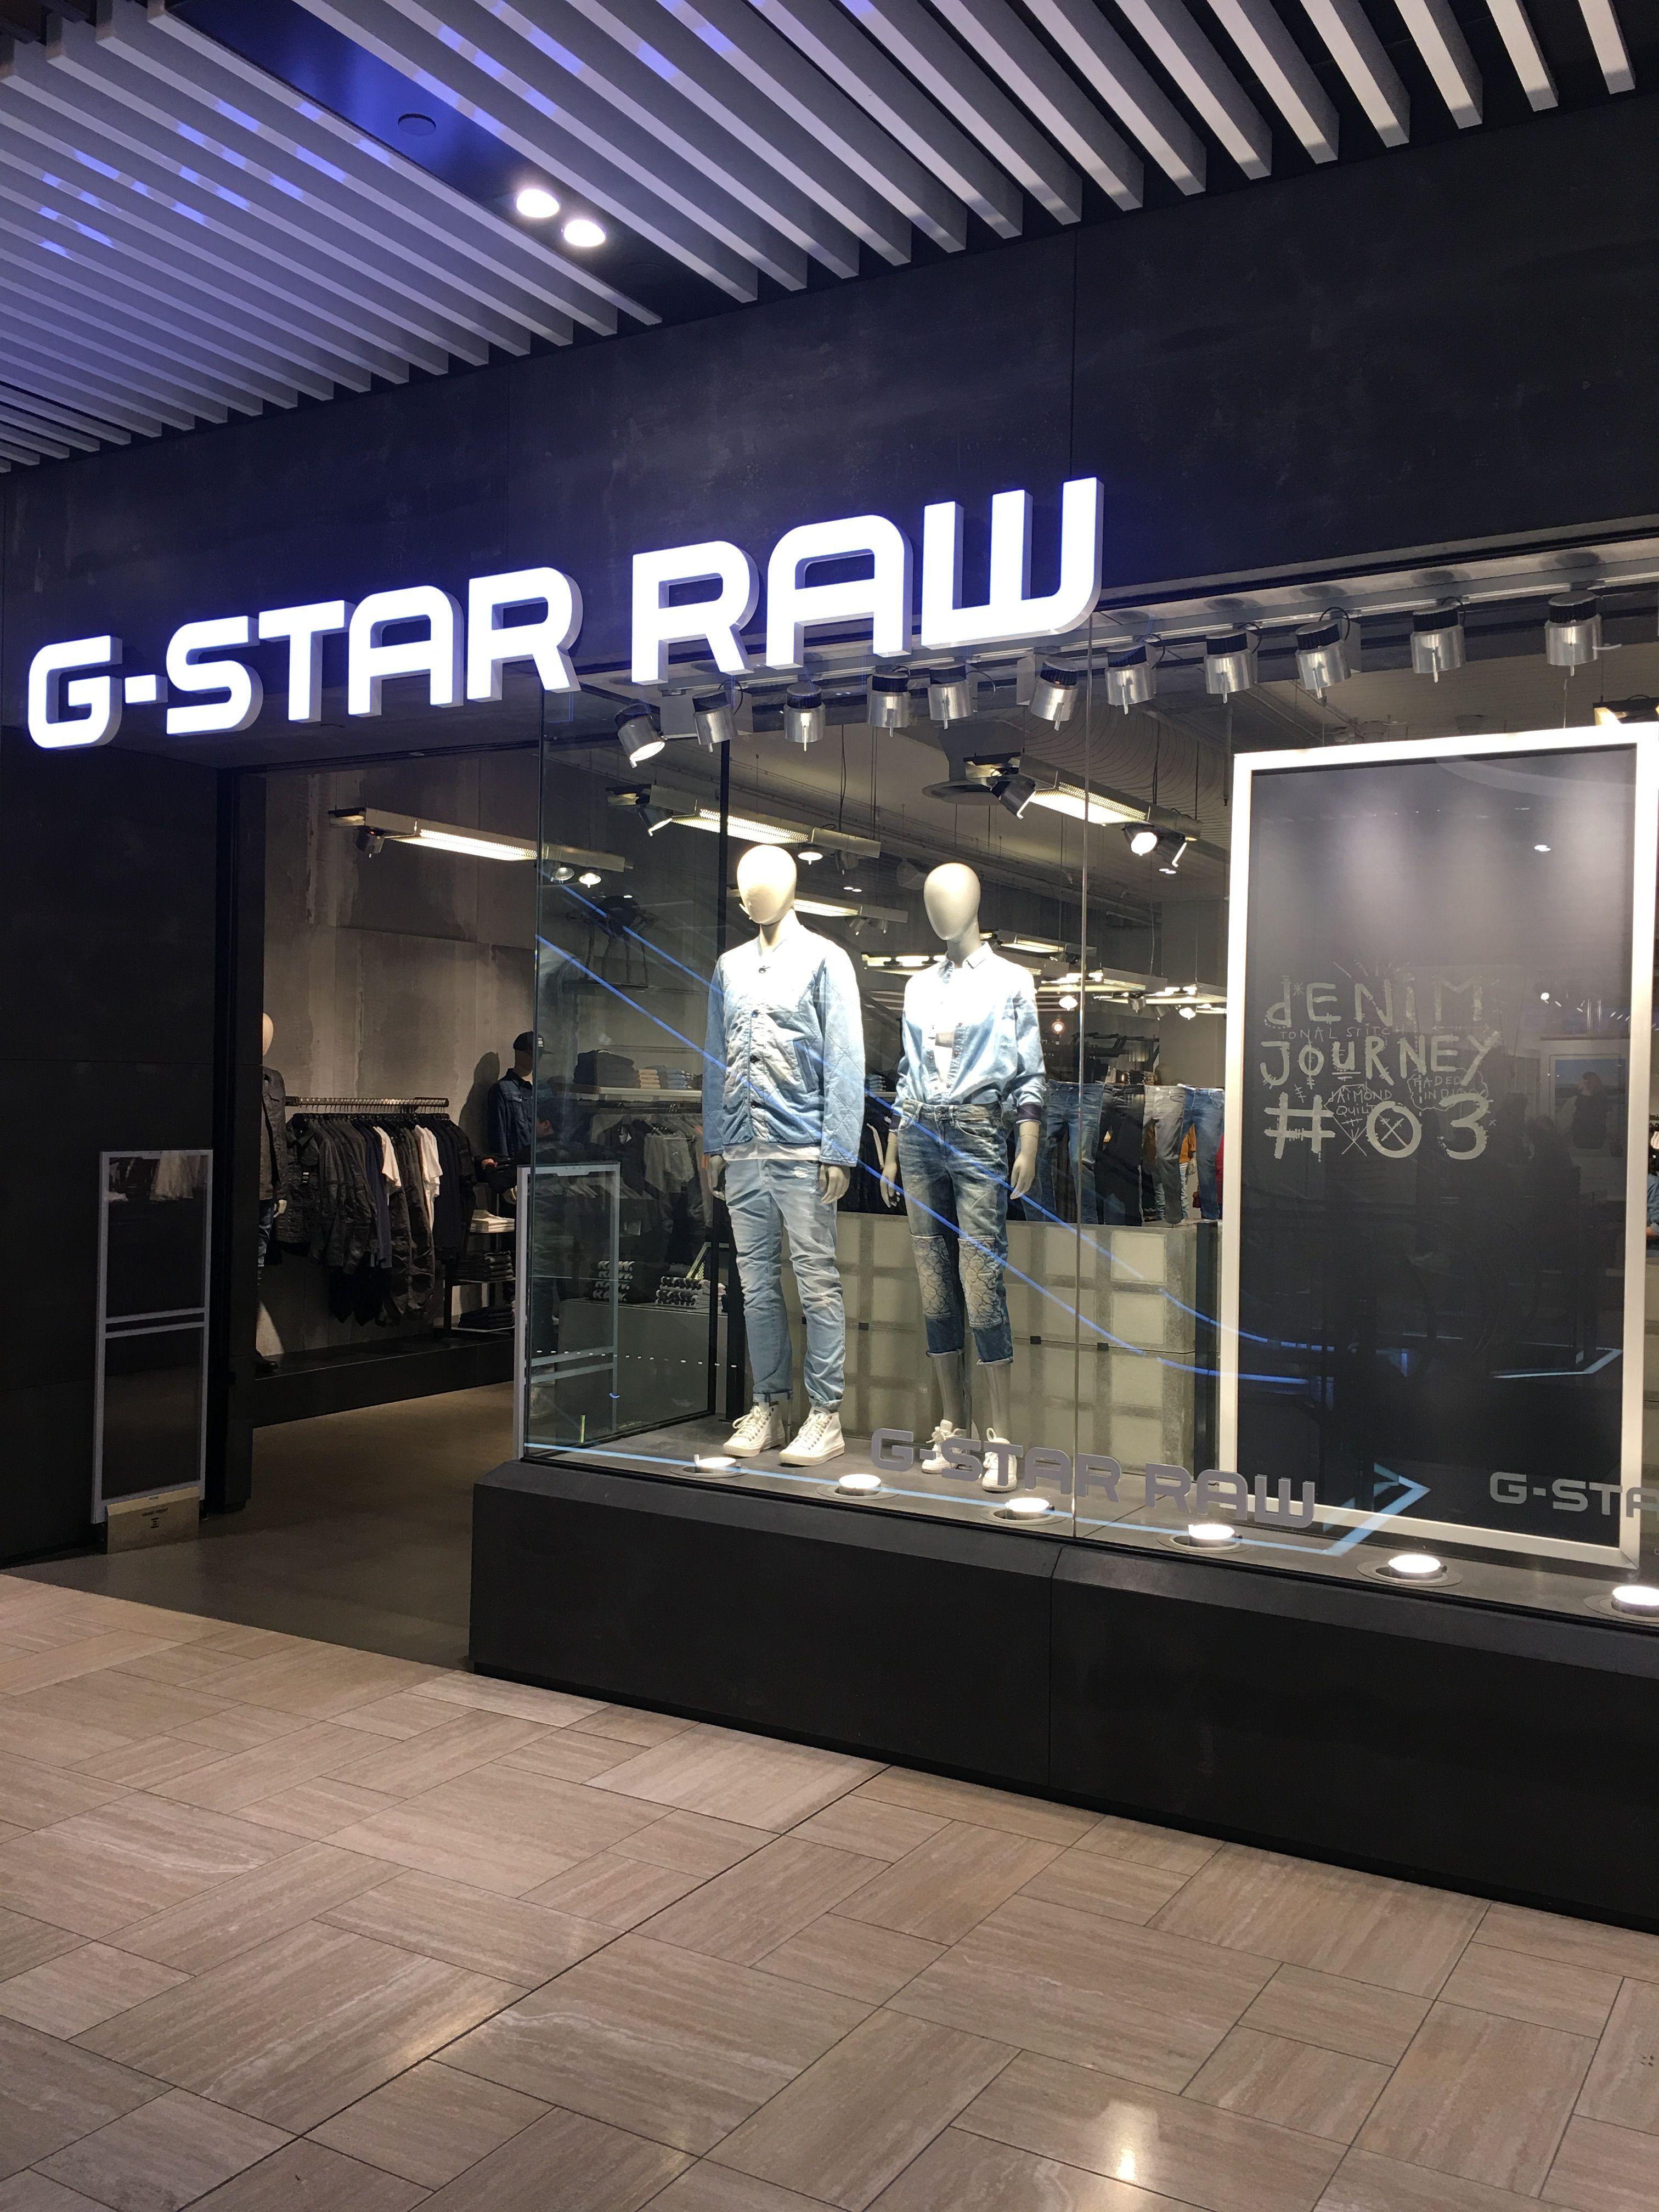 G Star Raw Melbourne Victoria Australia Where We Not Born To